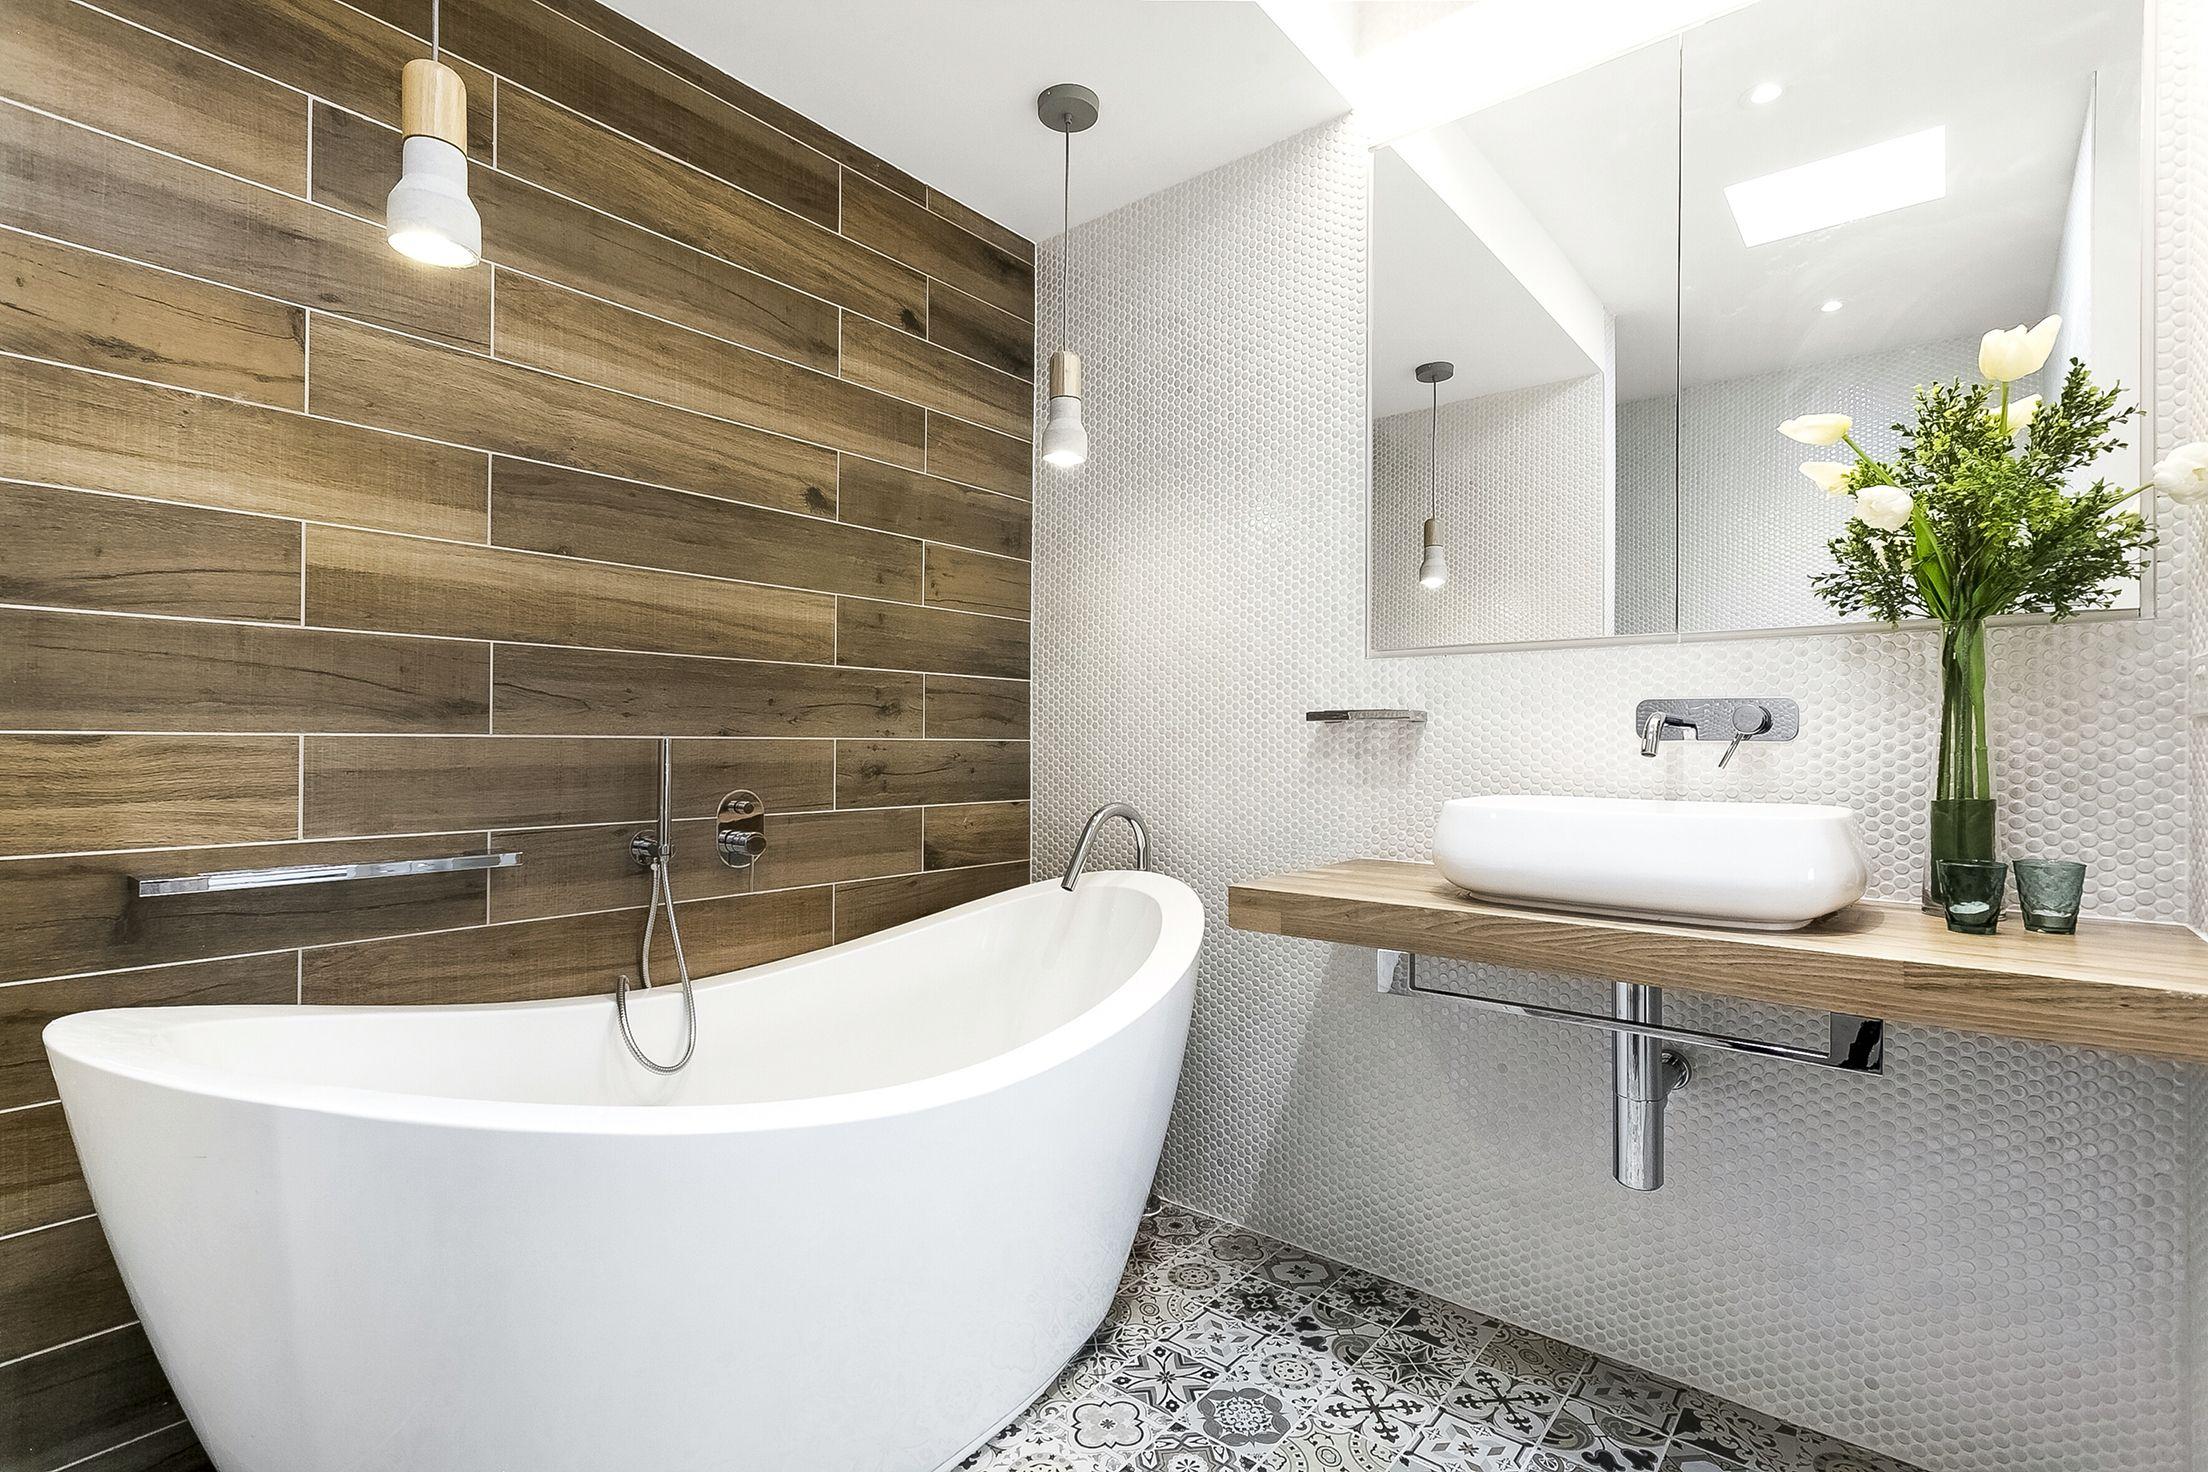 My modern rustic bathroom designed by me!, amazing freestanding ...